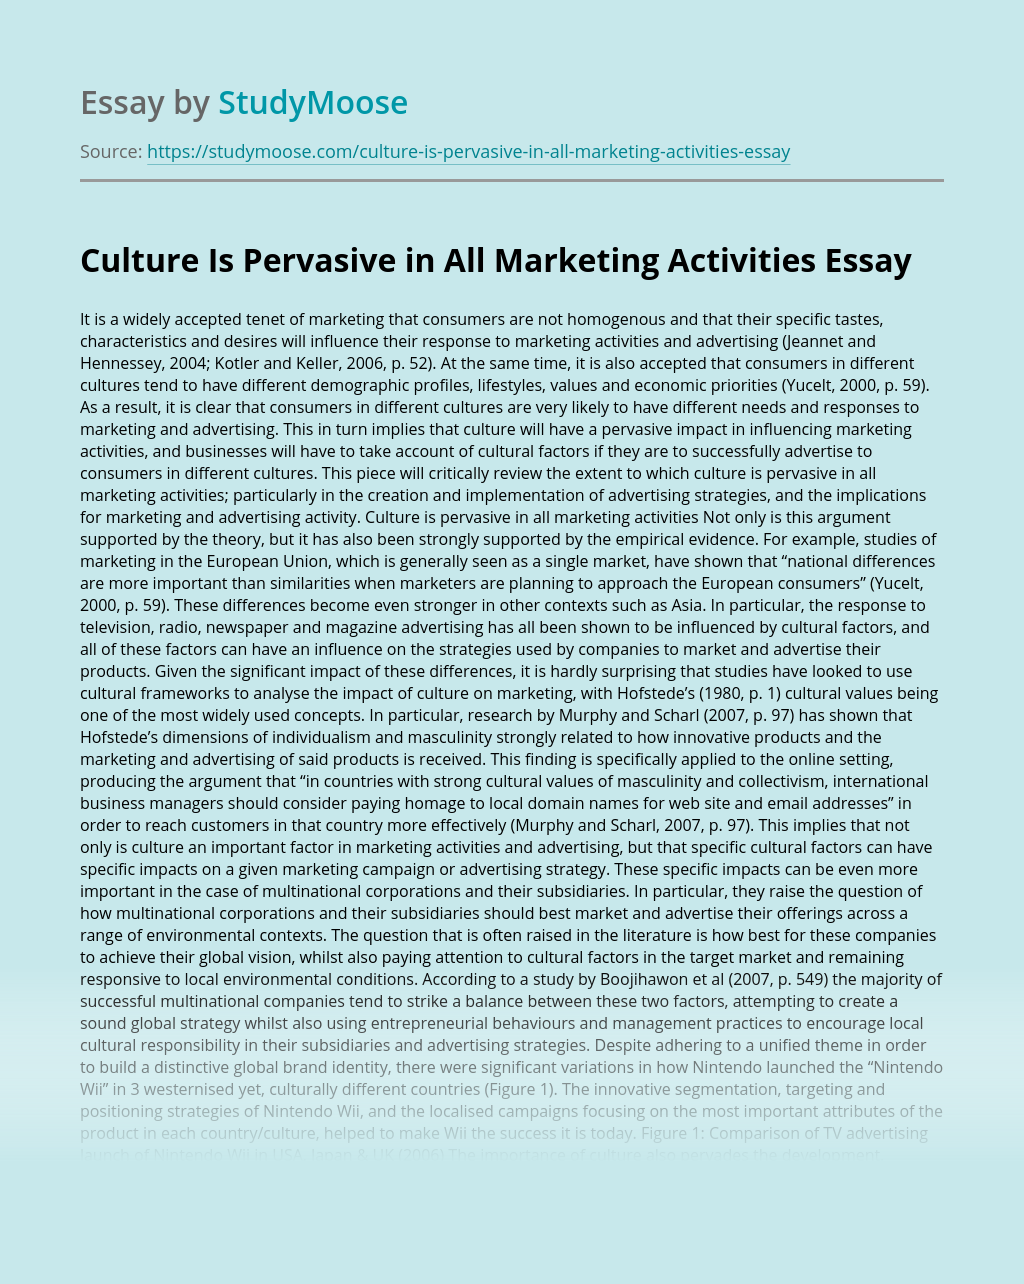 Culture Is Pervasive in All Marketing Activities